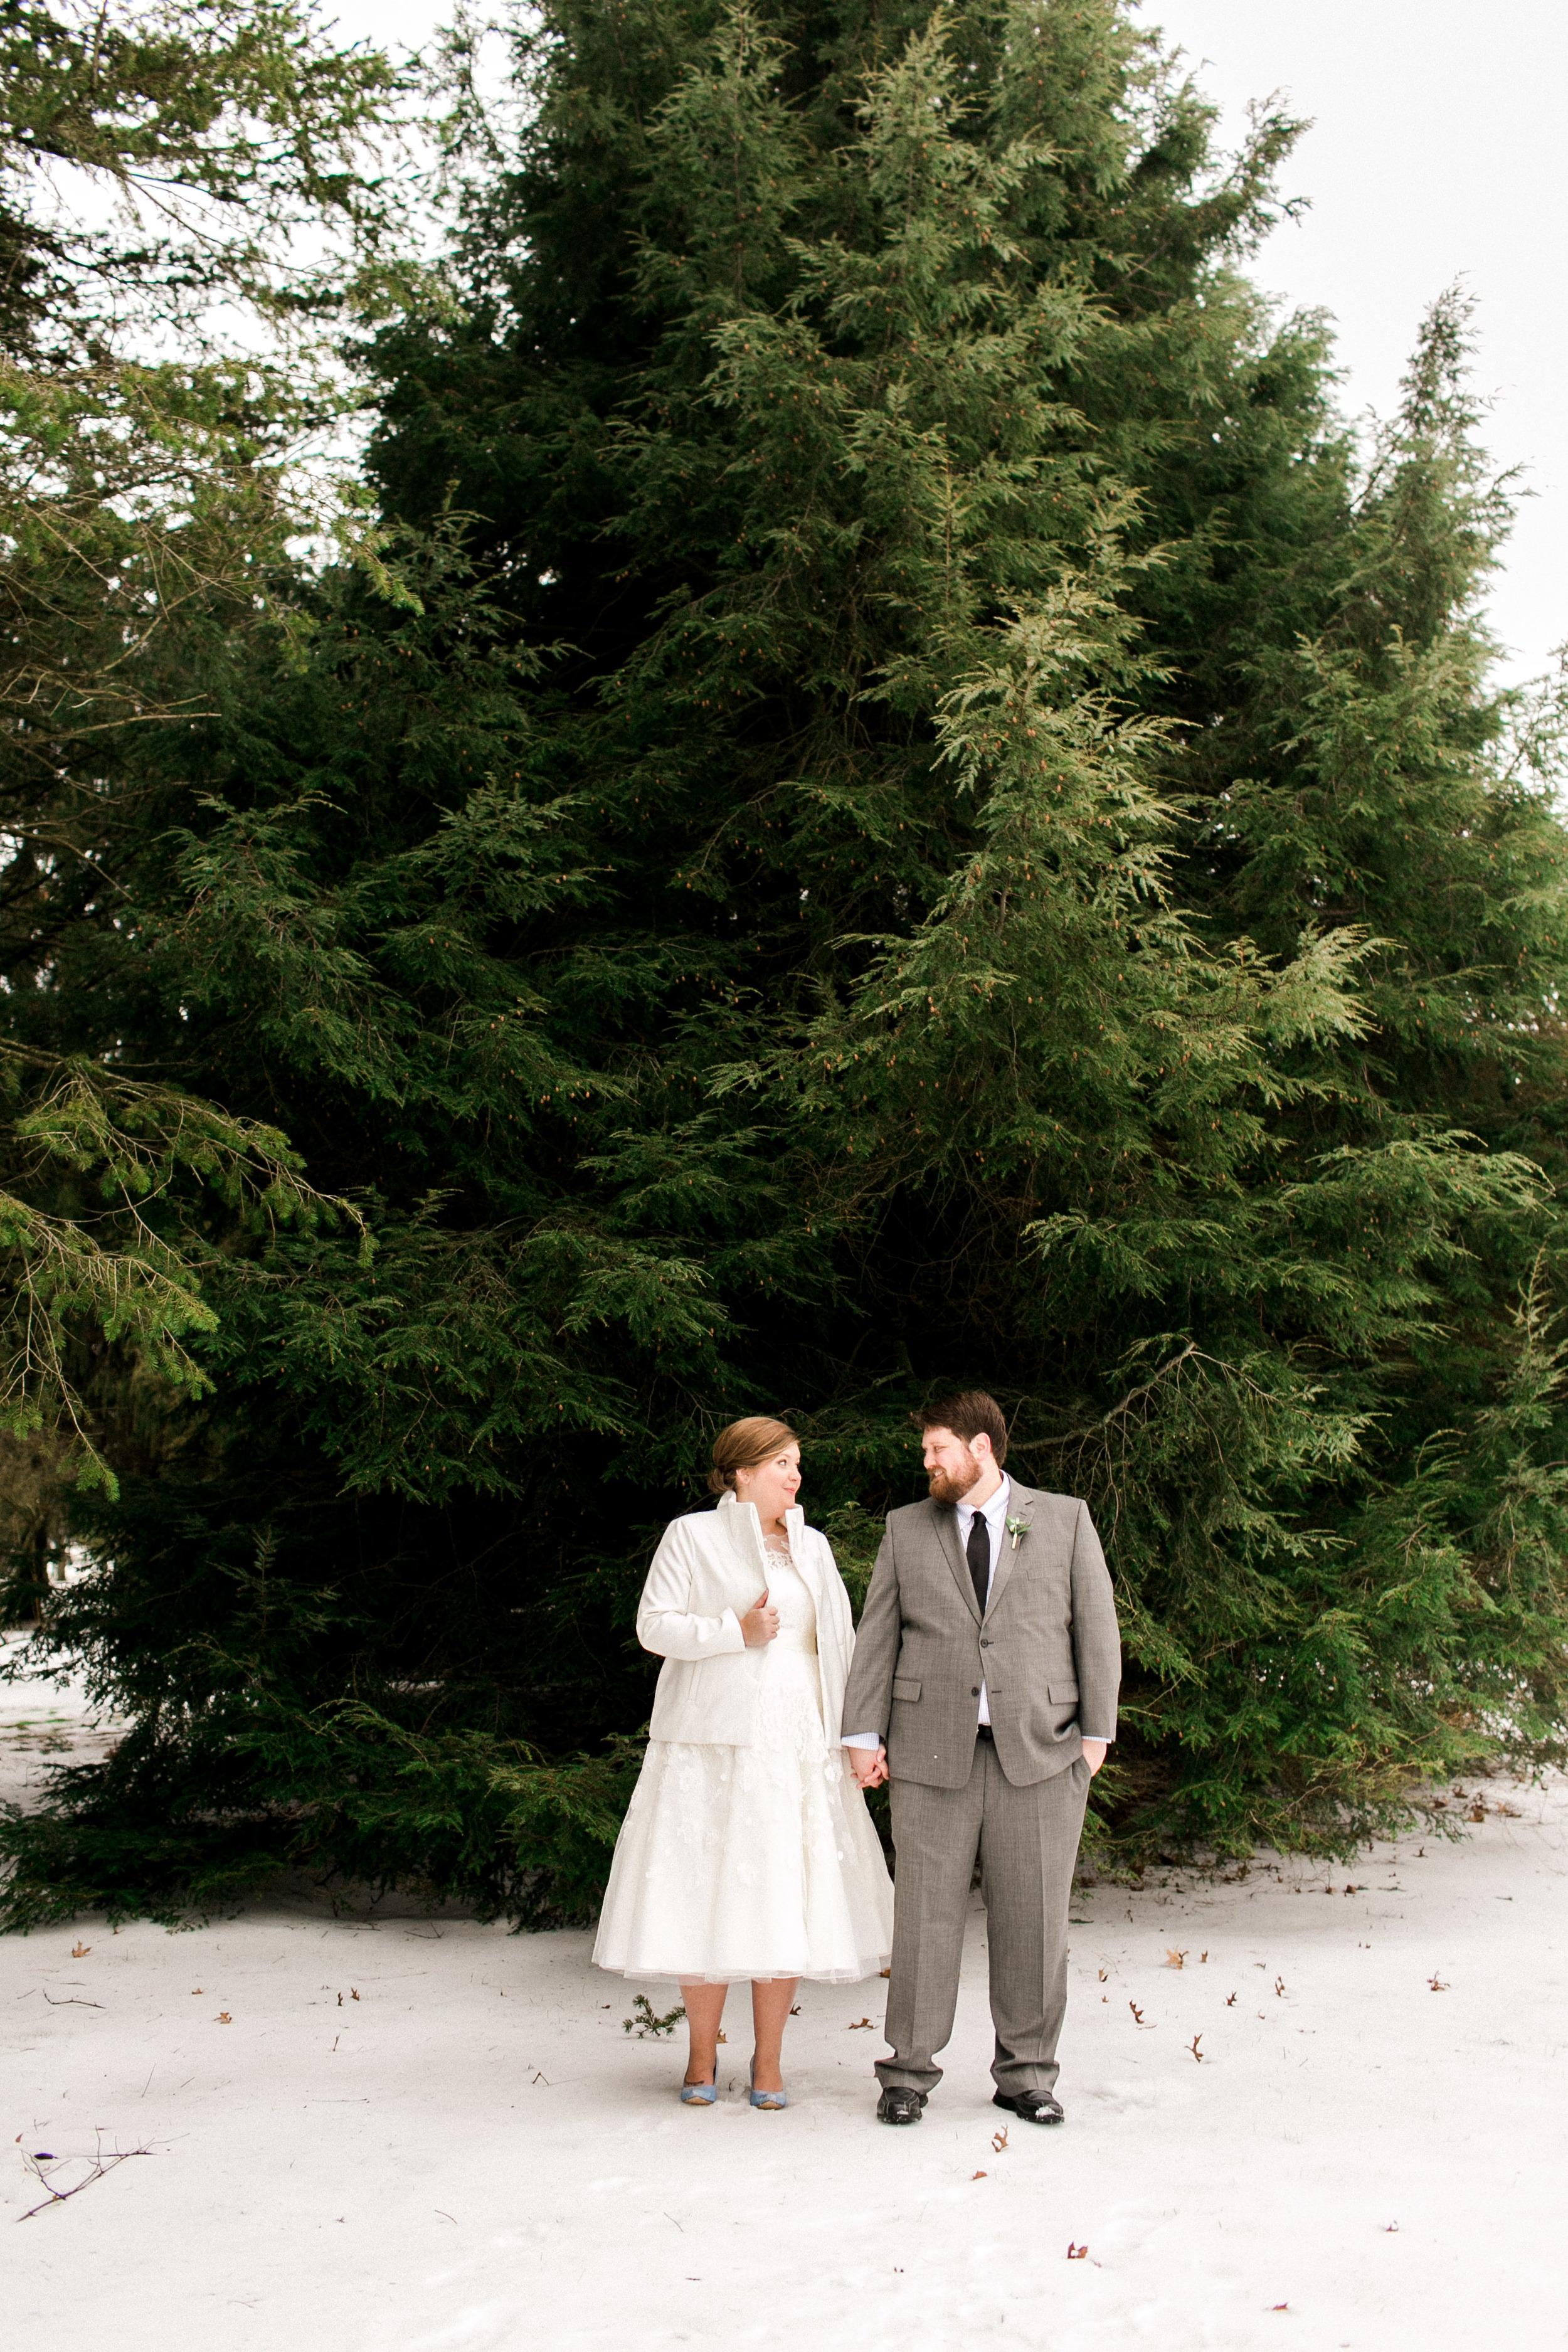 mayden photography_bridal portraits-41.jpg